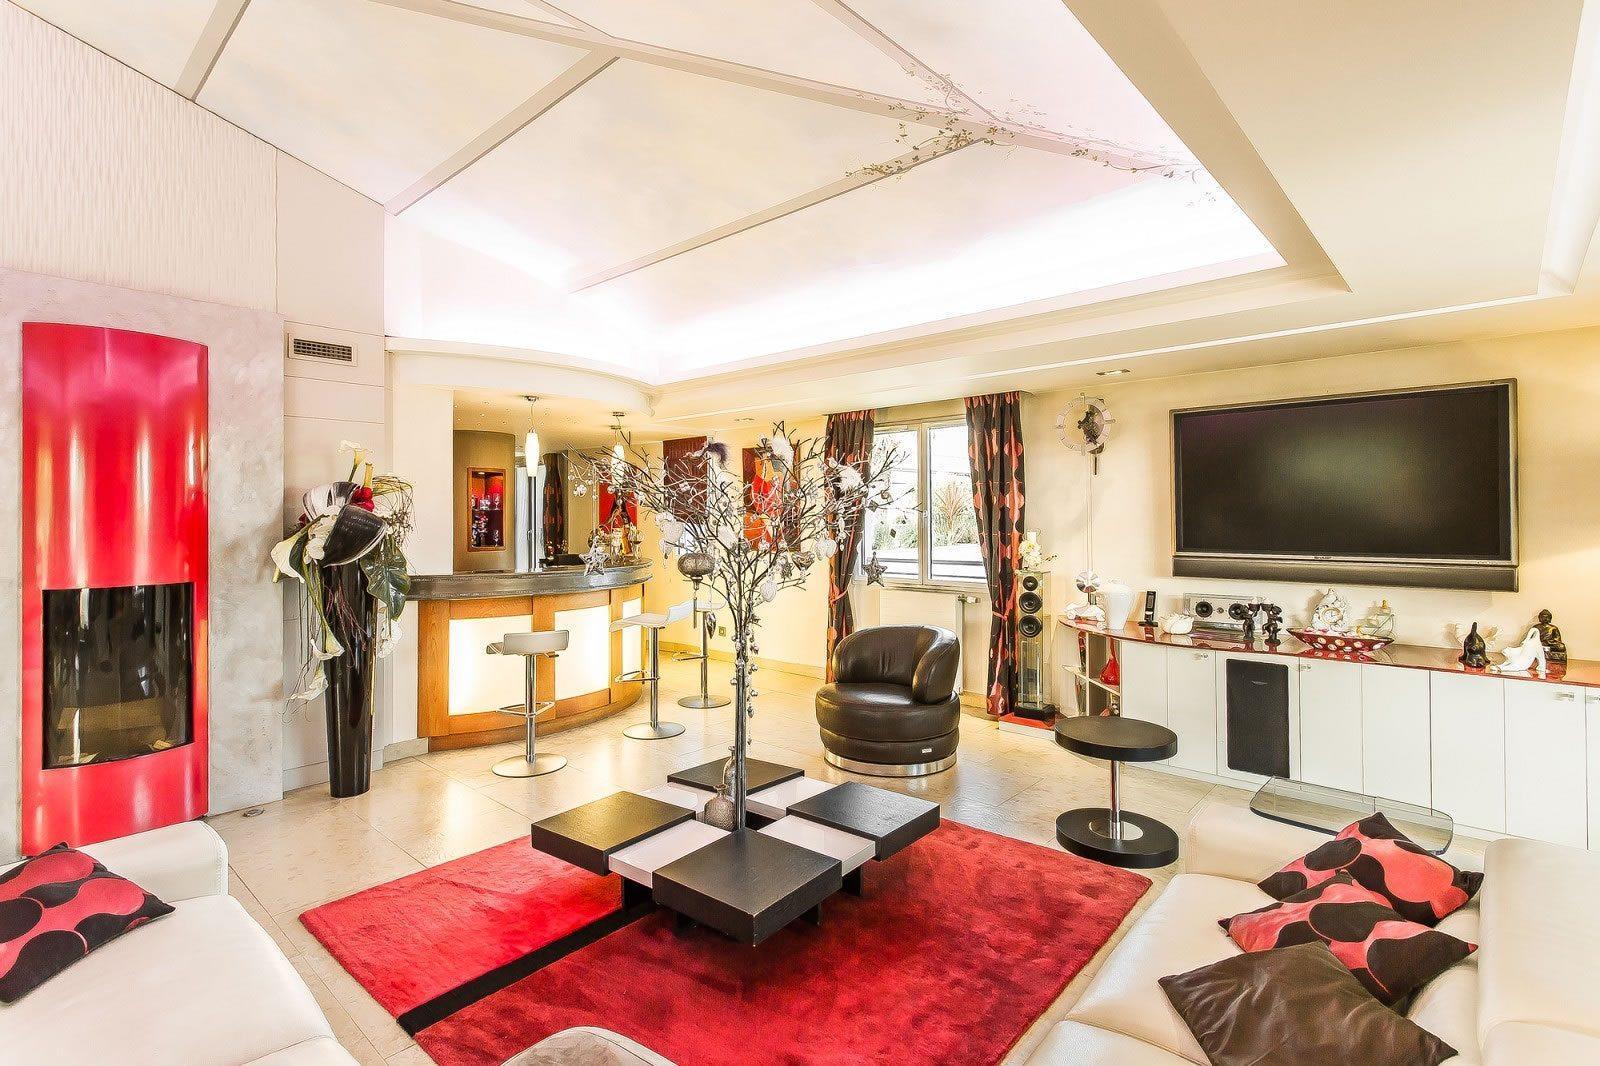 penthouse-grand-standing-a-vendre-tassin-la-demi-lune-bourg-piscine-home-cinema-garages-cave